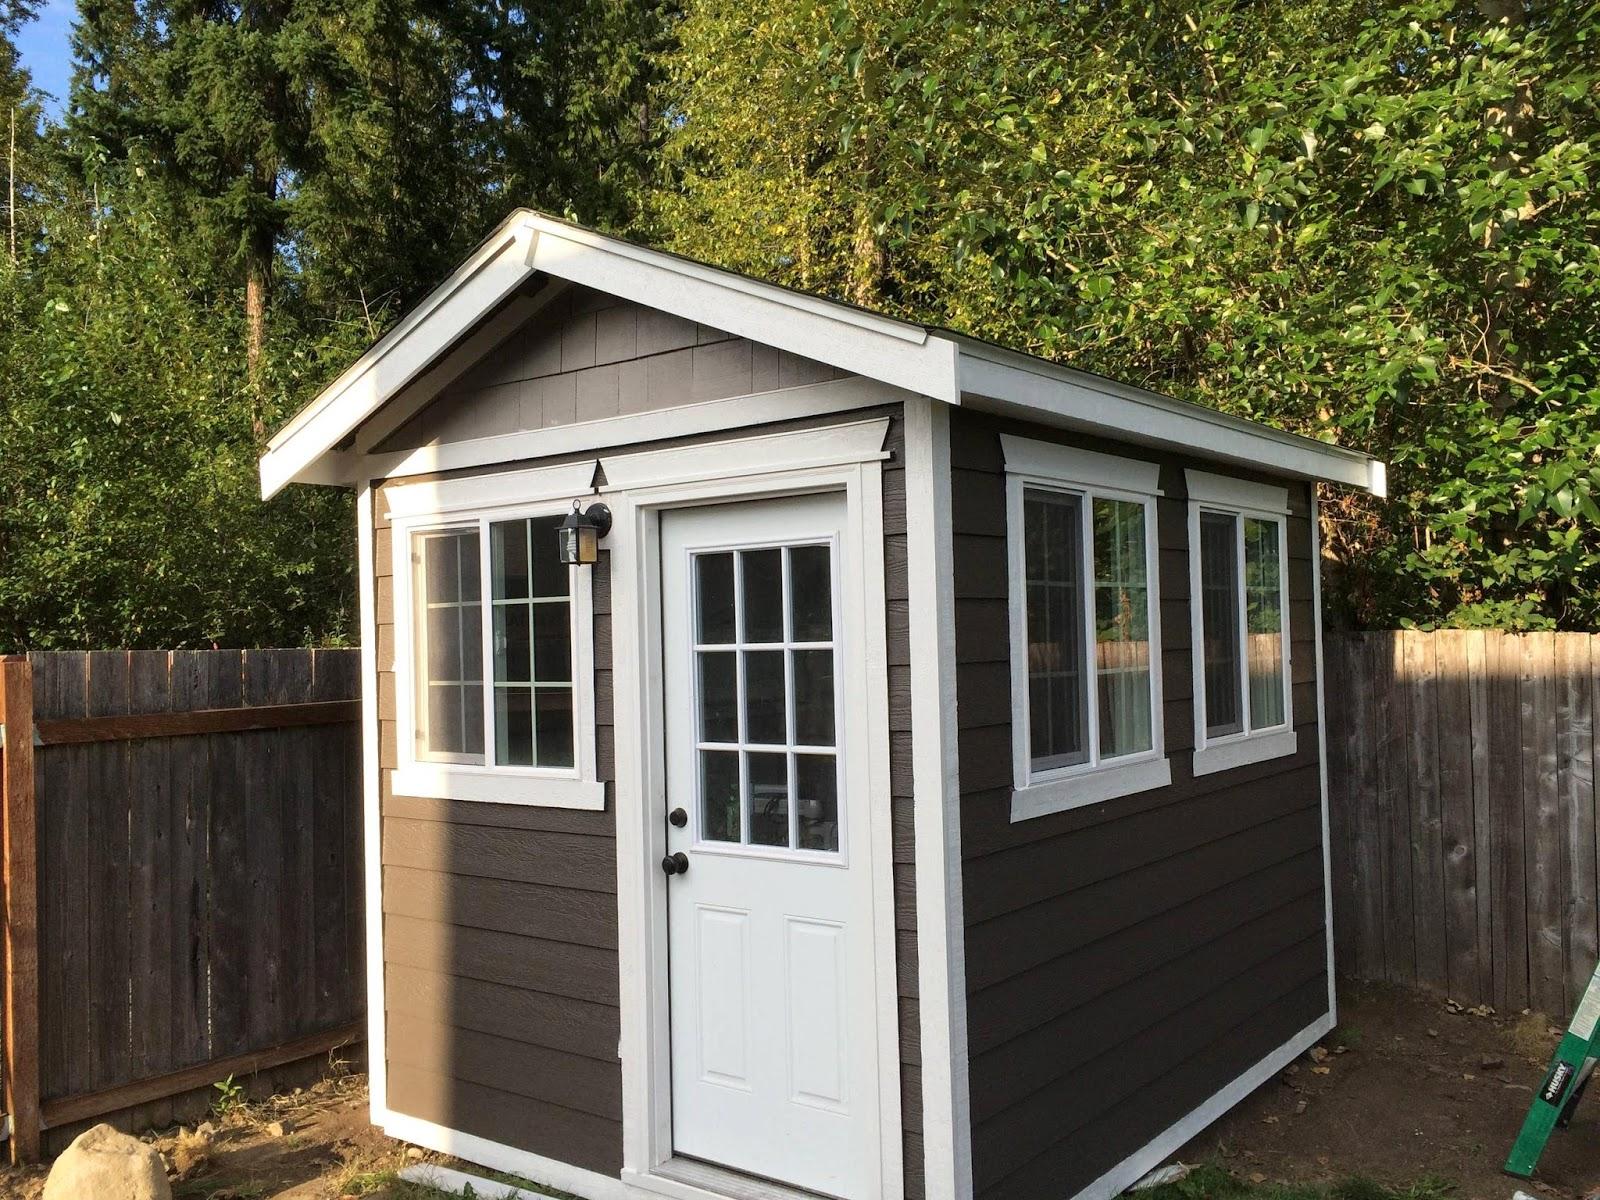 World Of Technology: Backyard Home Office Build (43 Pics)